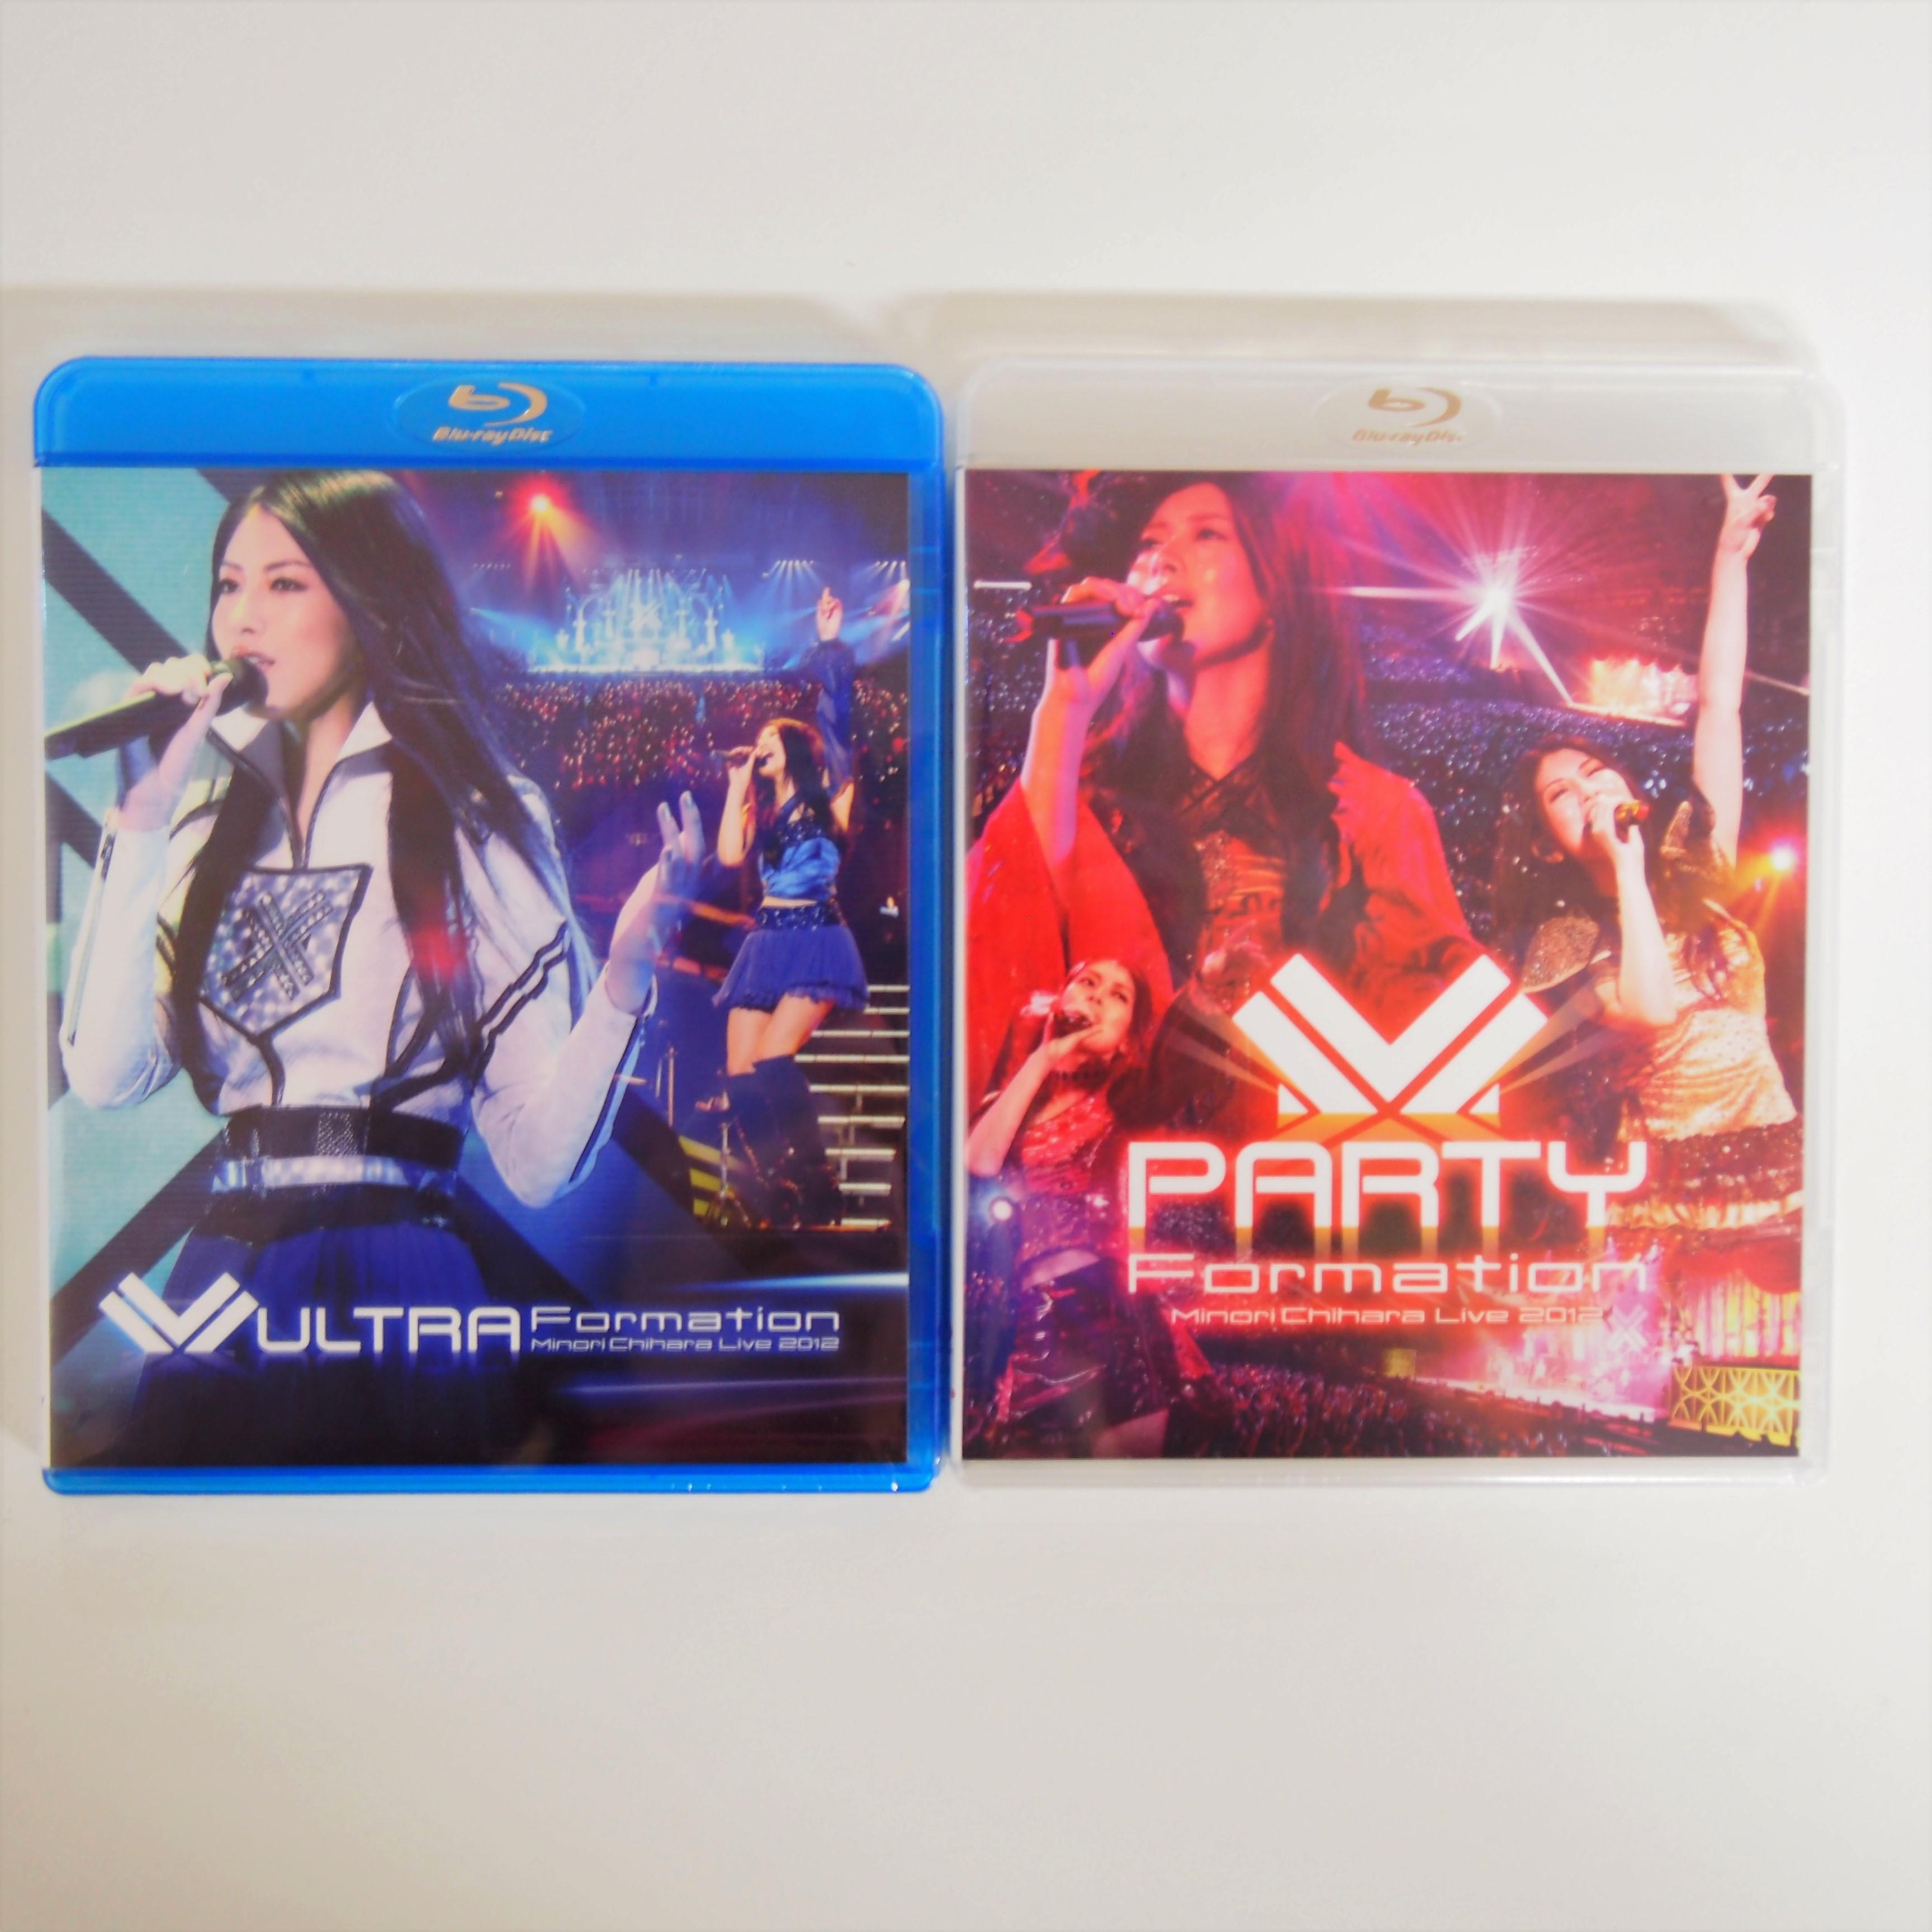 LIVEBD Minori Chihara Live 2012 ULTRA-Formation Live Blu-ray&Minori Chihara Live 2012 PARTY-Formation Live Blu-ray 茅原実里